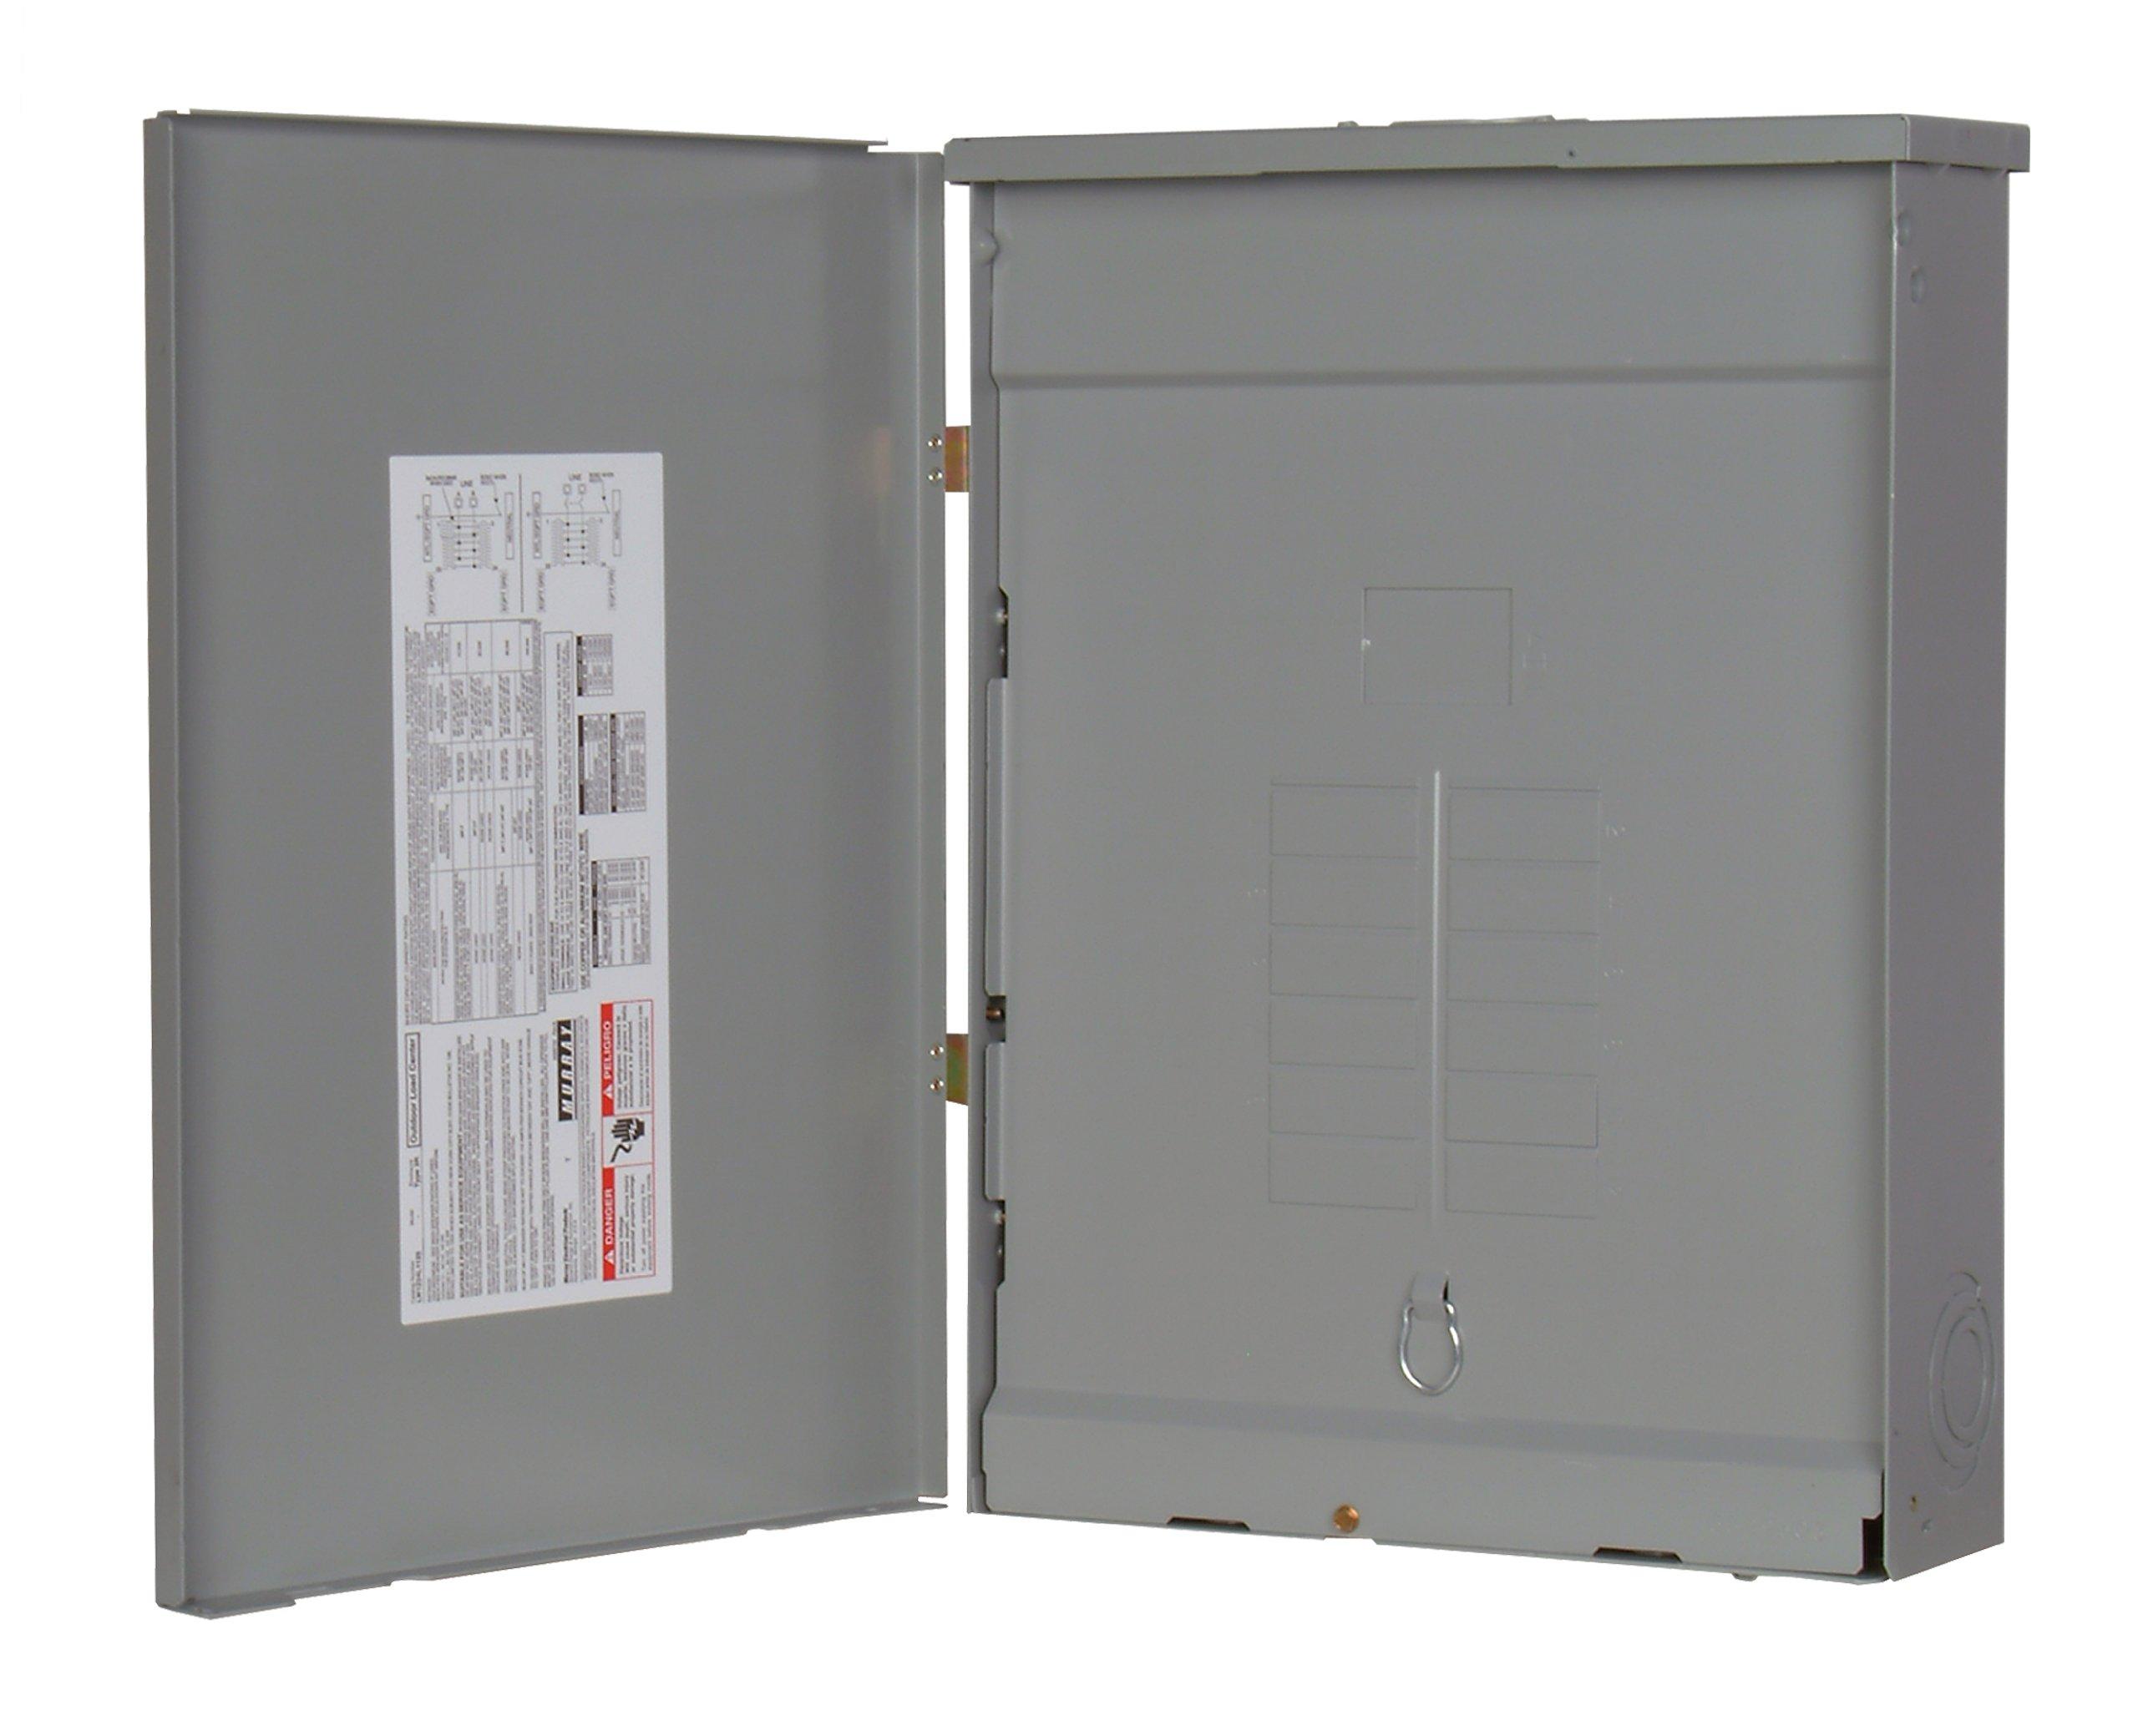 Murray LW1224L1125 Load Center, 12 Space, 24 Circuit, Main Lug, 125A